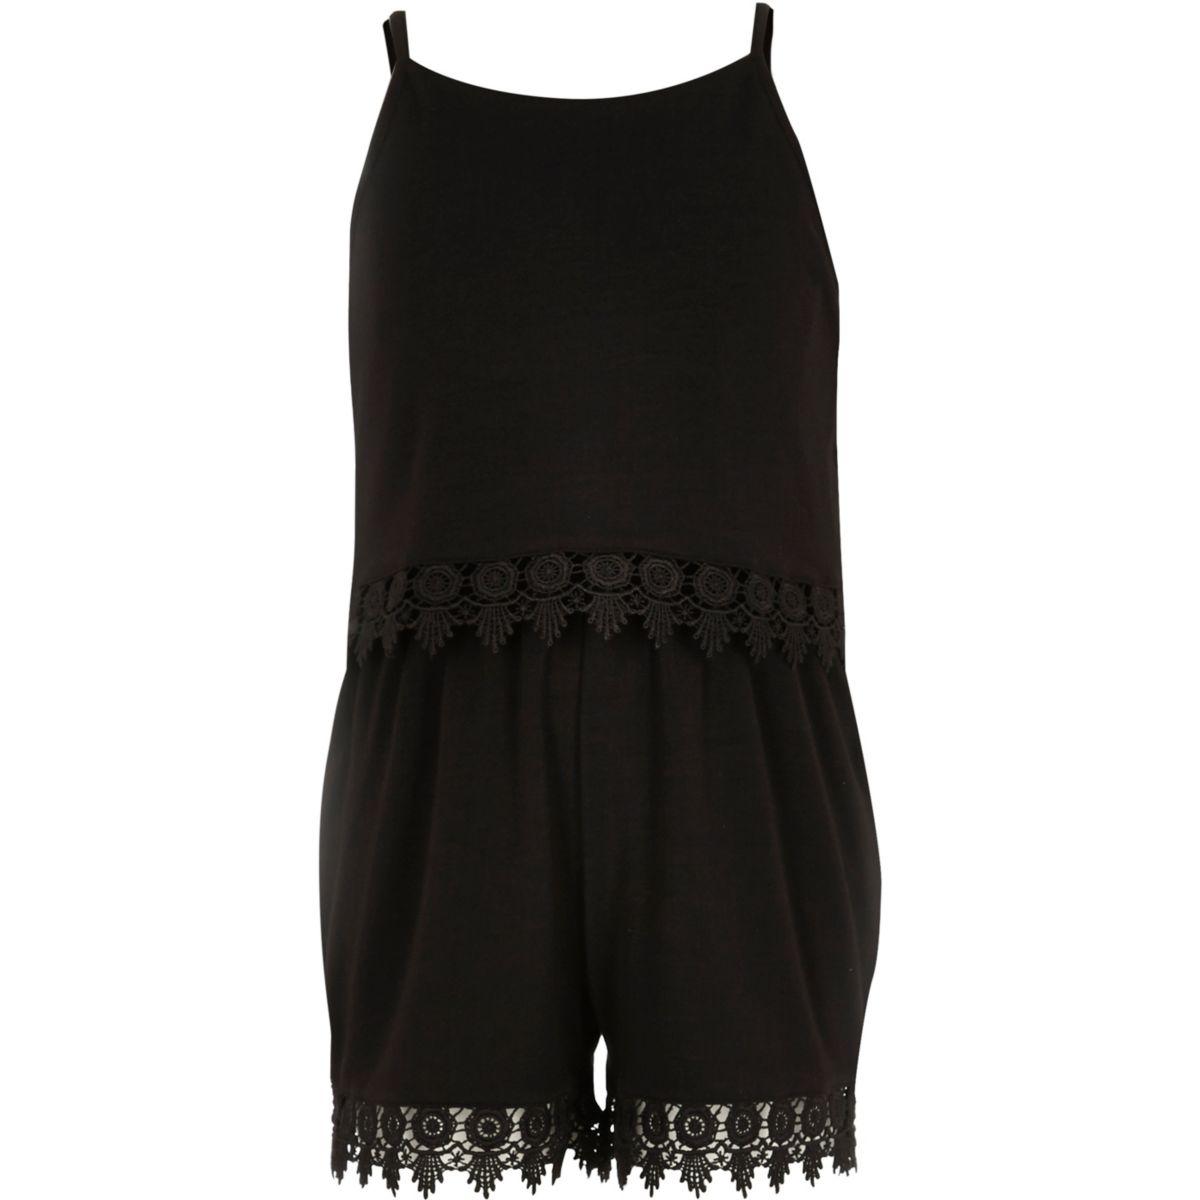 Girls black crochet double layer playsuit